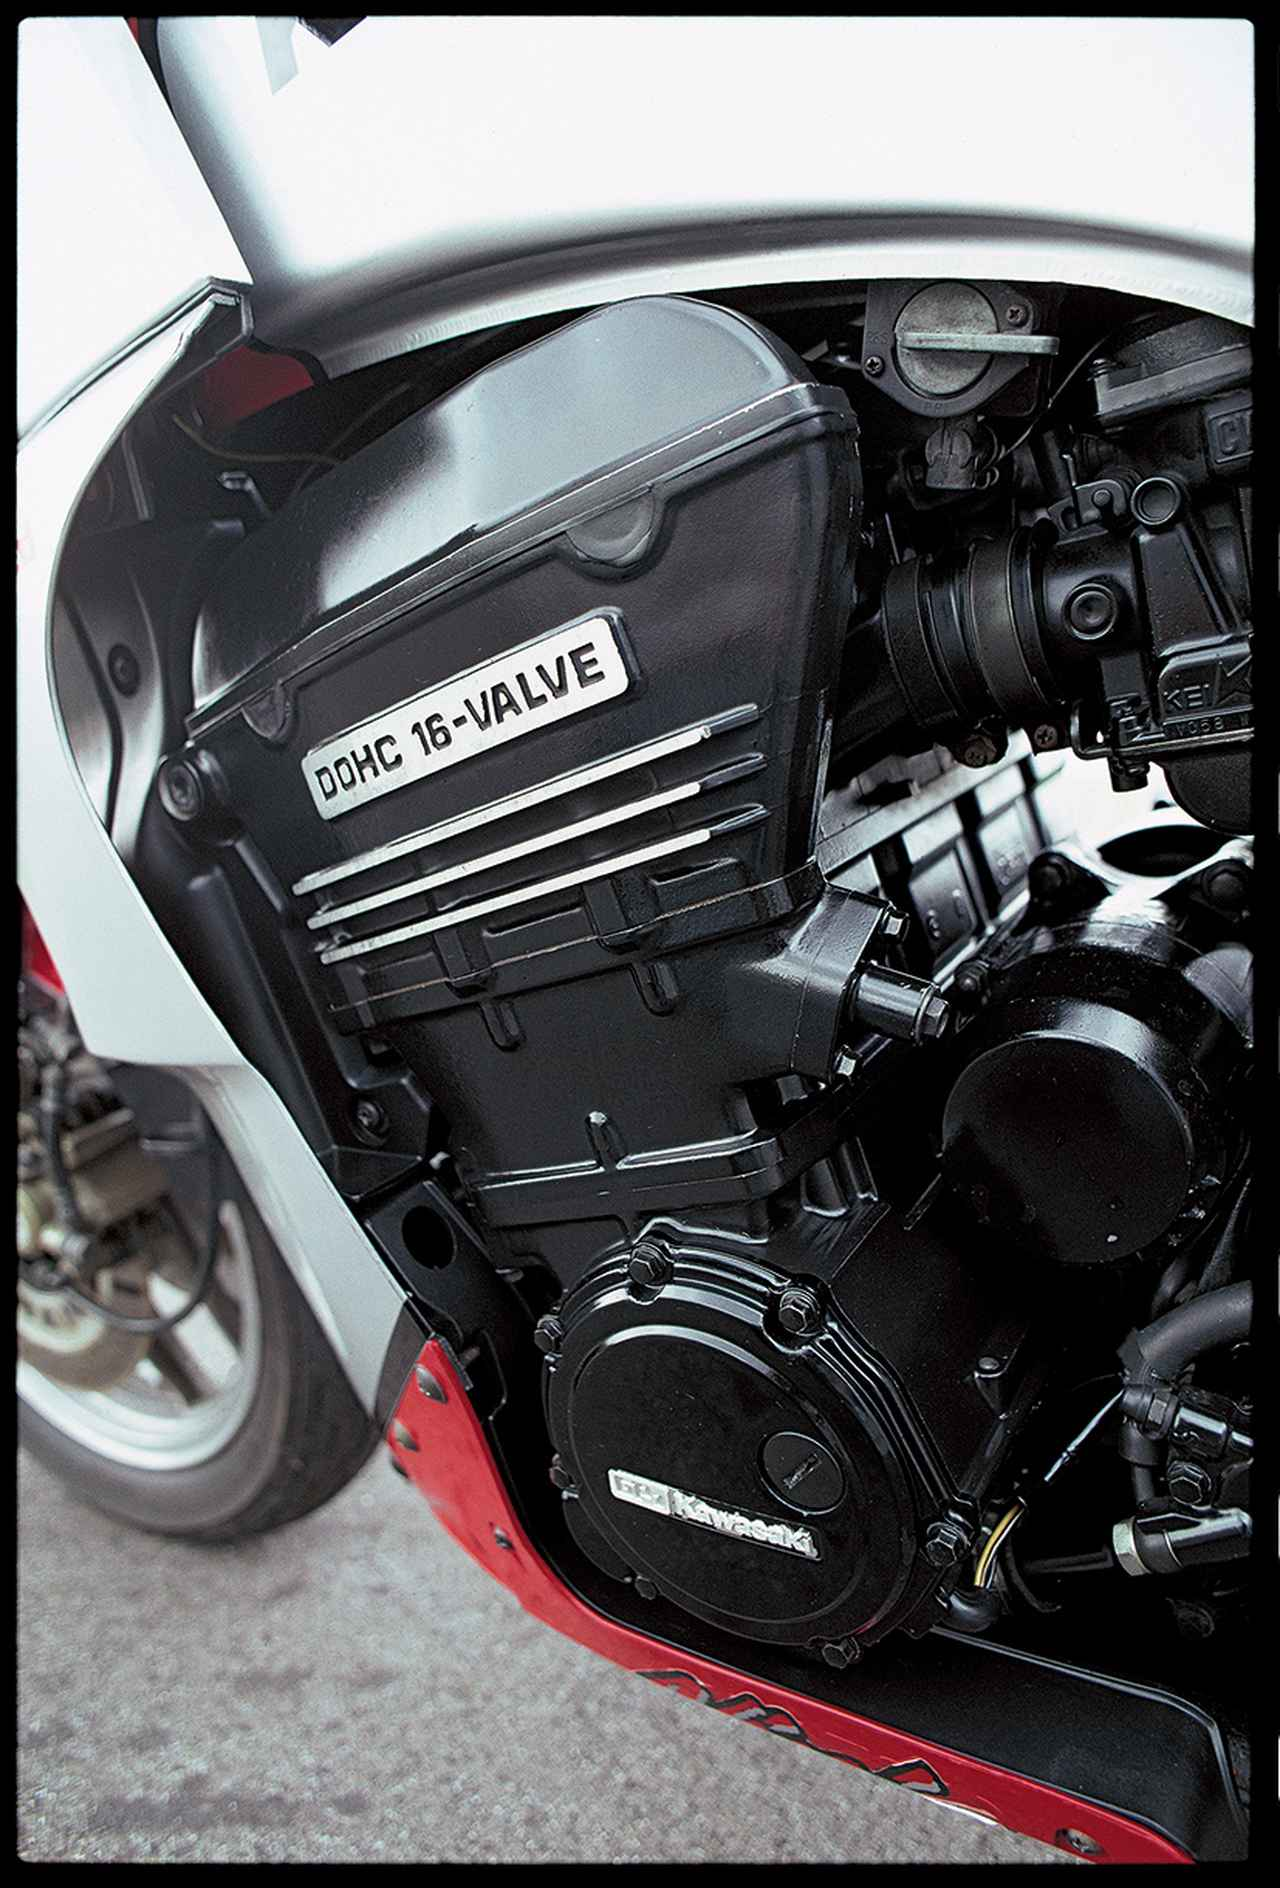 Images : 3番目の画像 - GPz900R NInja - webオートバイ